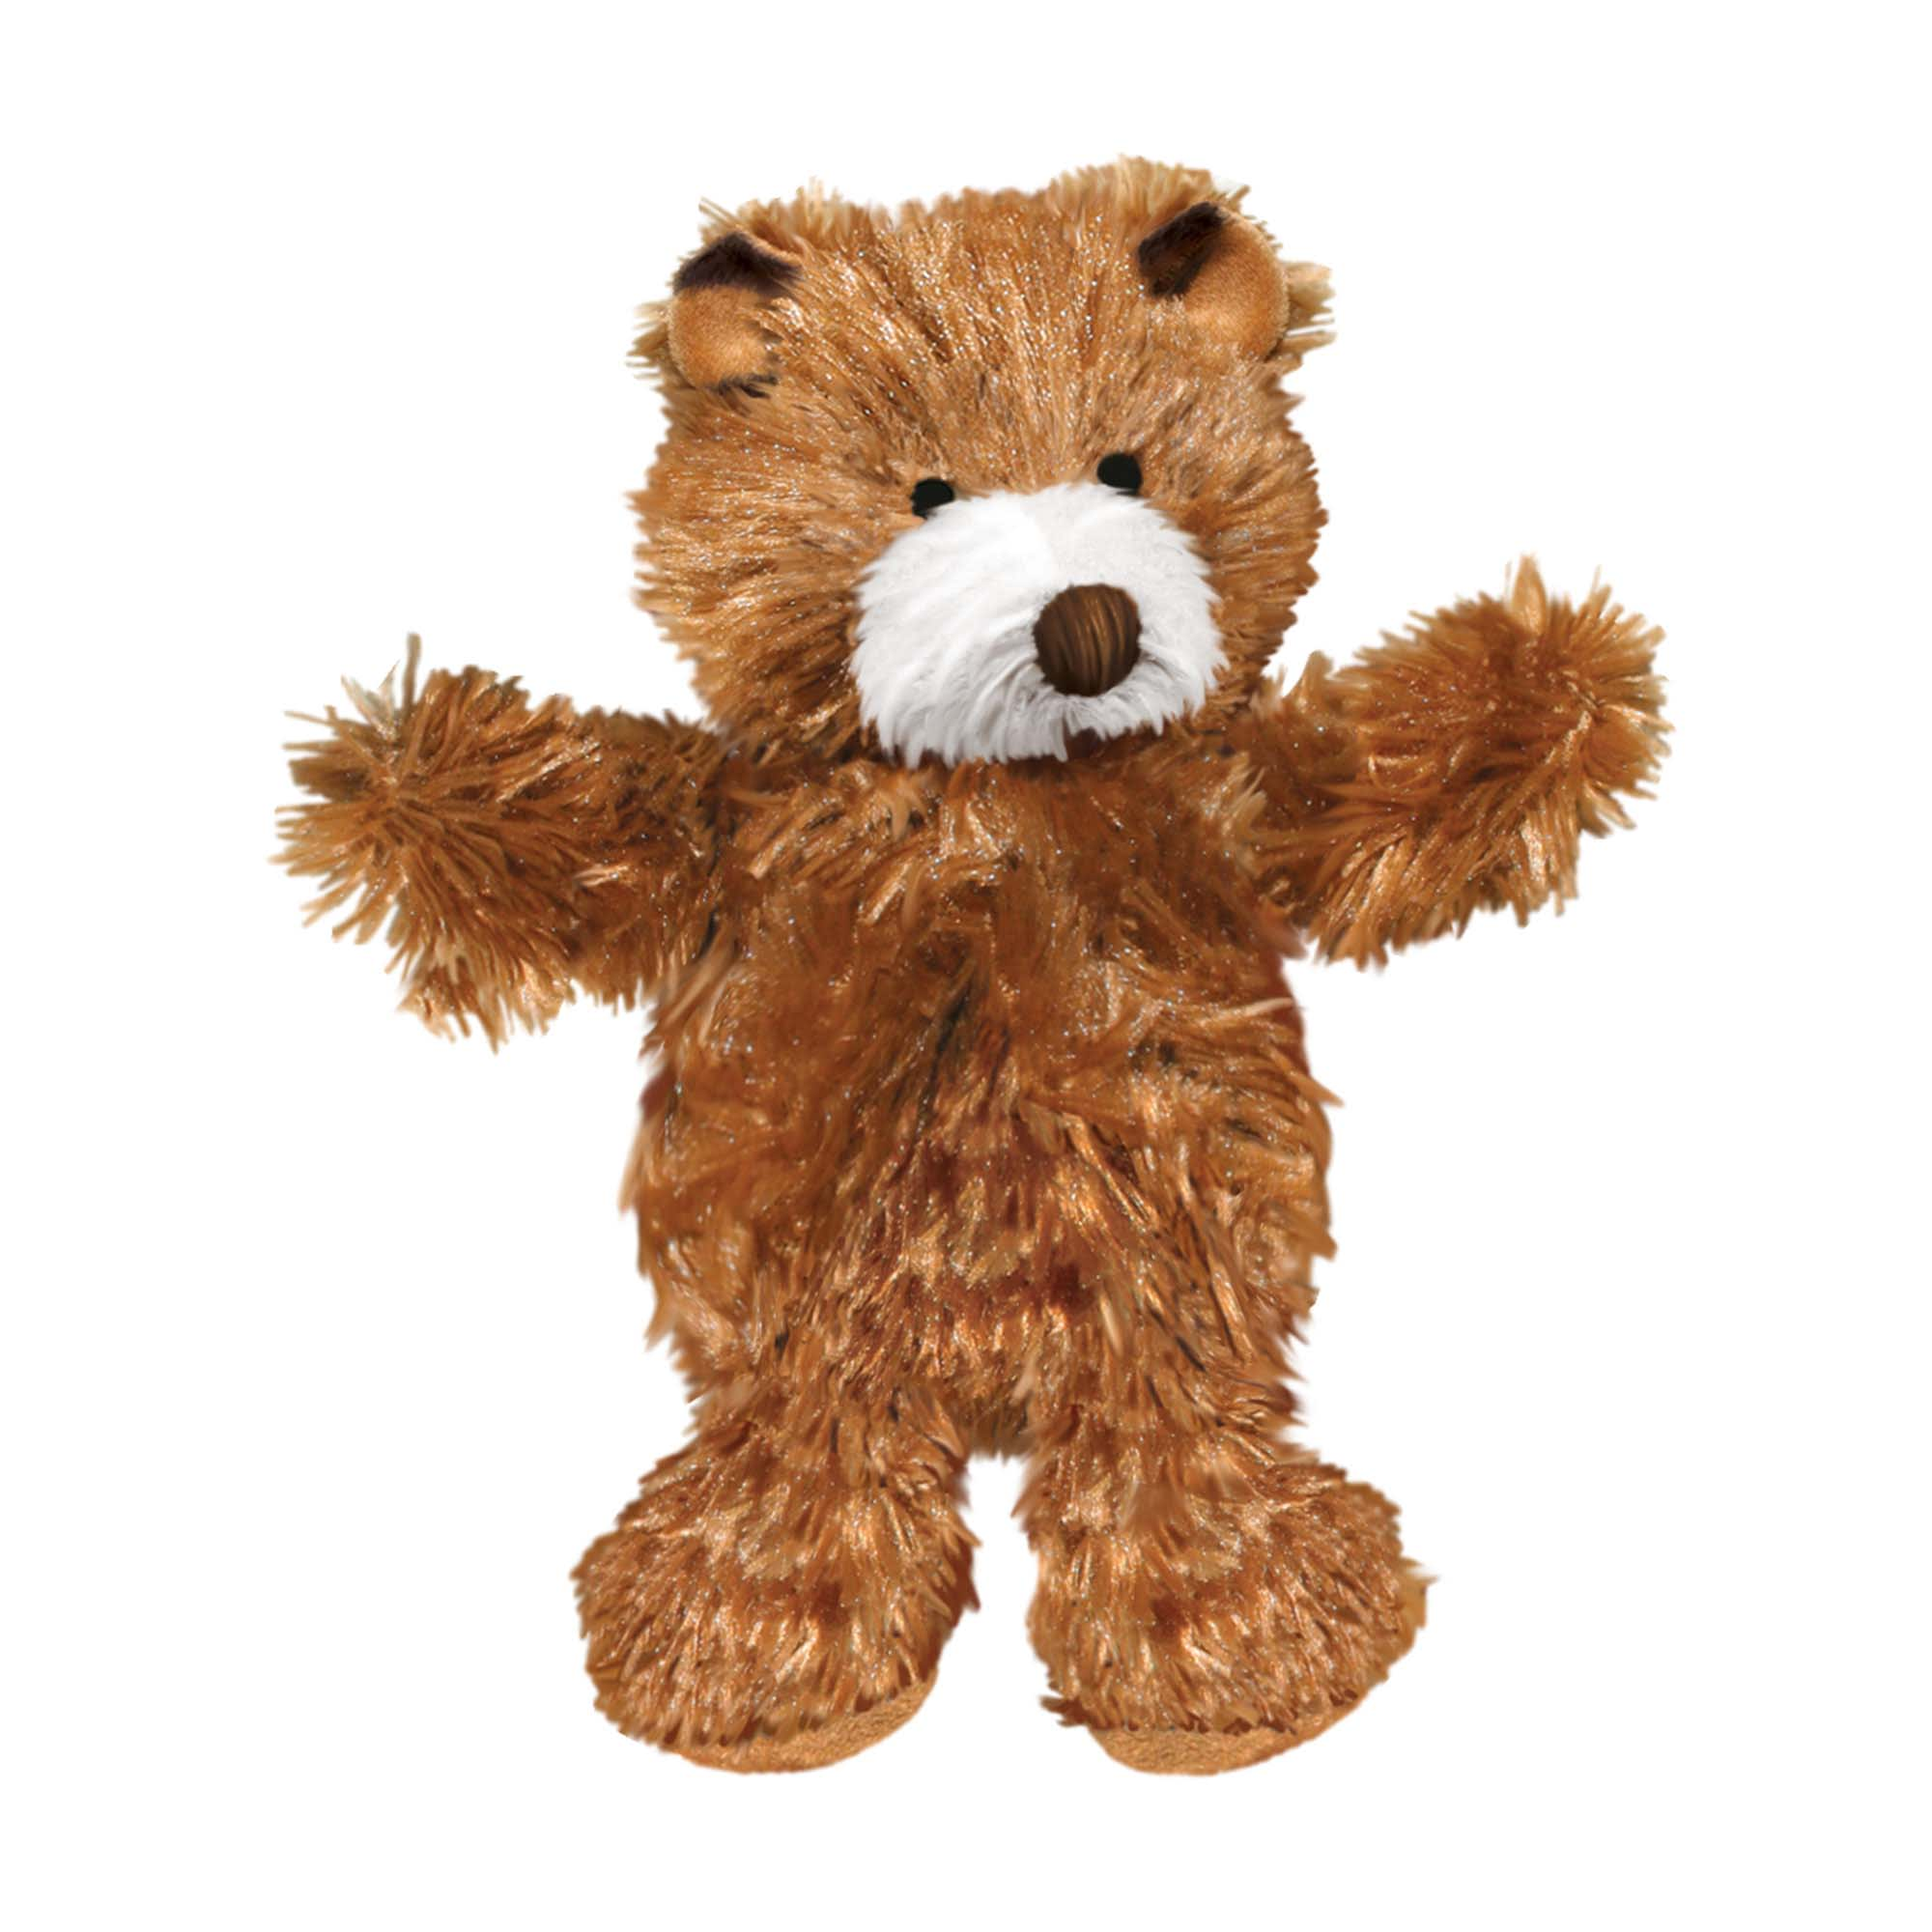 Kong Teddy Bear Dog Toy X Small Petco